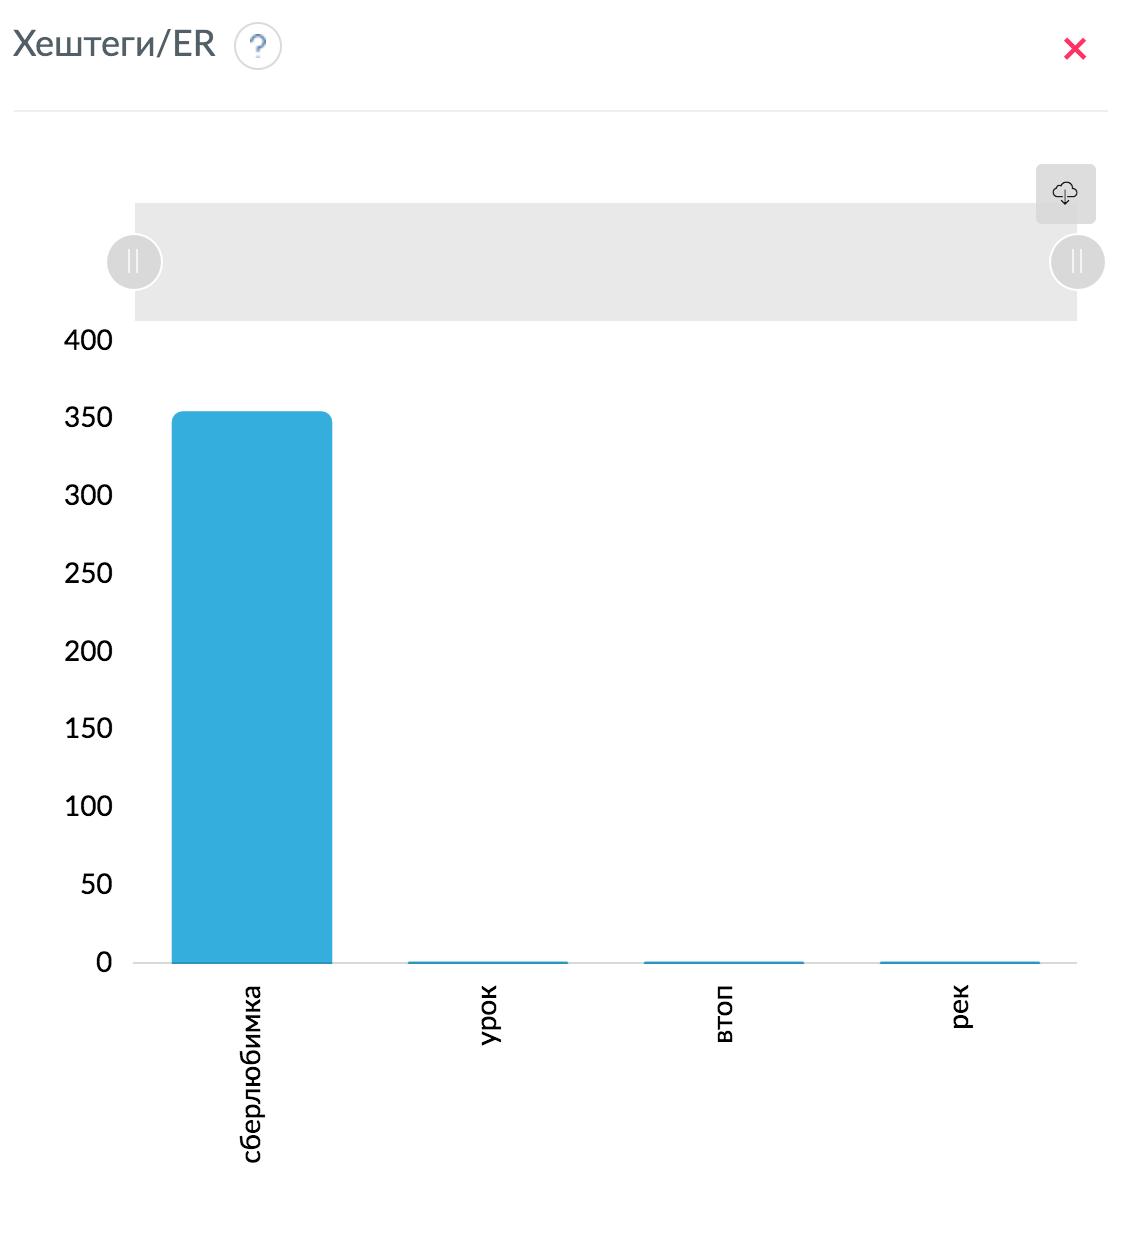 Анализ хештегов в TikTok